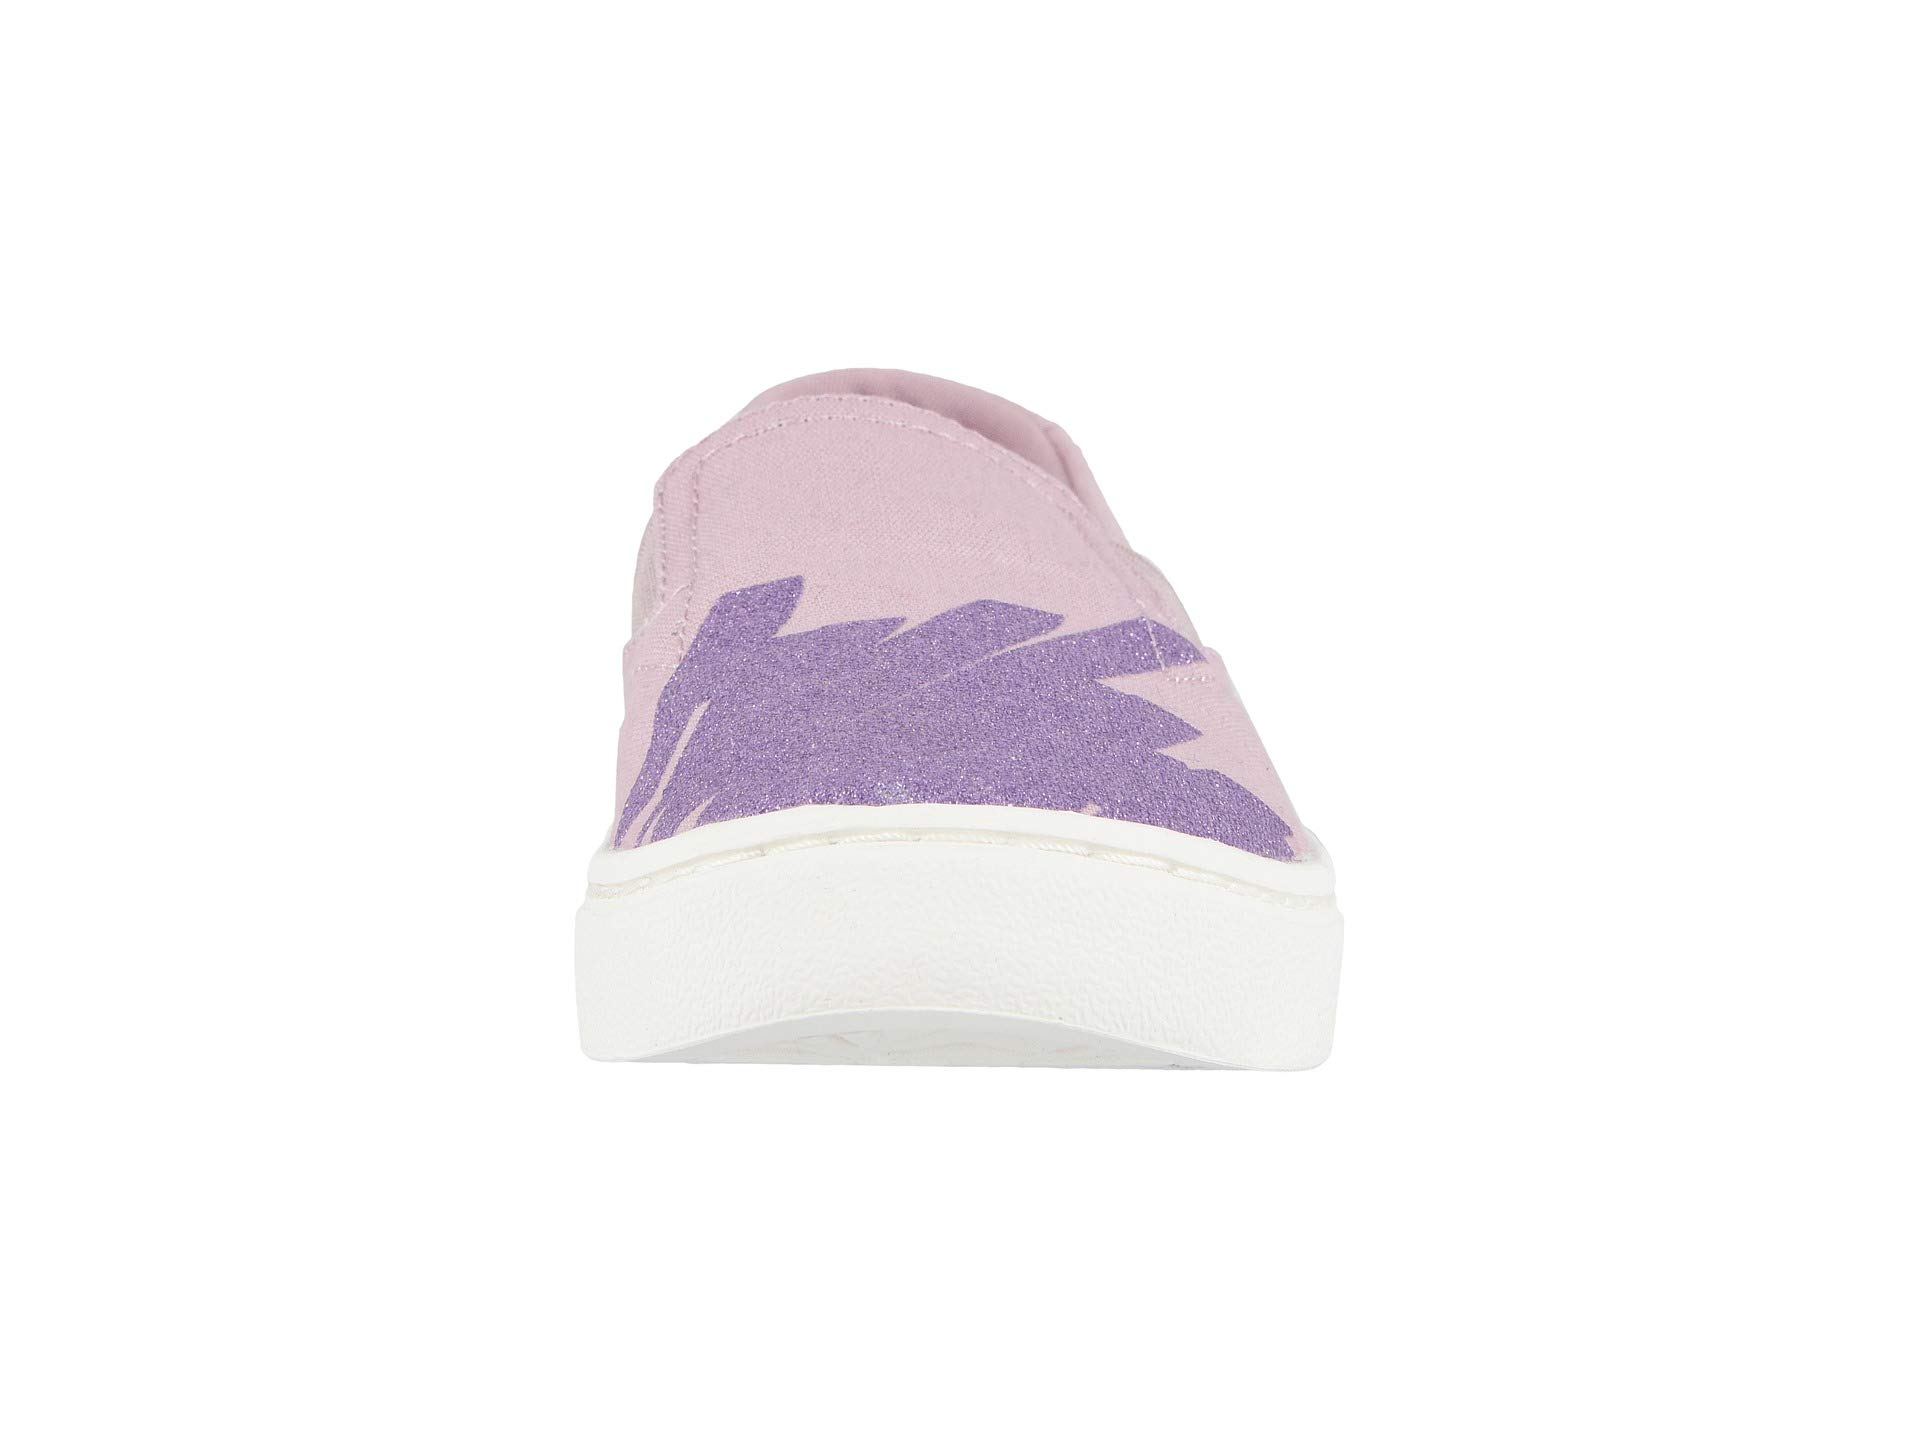 TOMS Youth Luca Slip-On Shoes, Size: 3.5 M US Big Kid, Color: Brnsh Lilac Glt Star by TOMS Kids (Image #5)